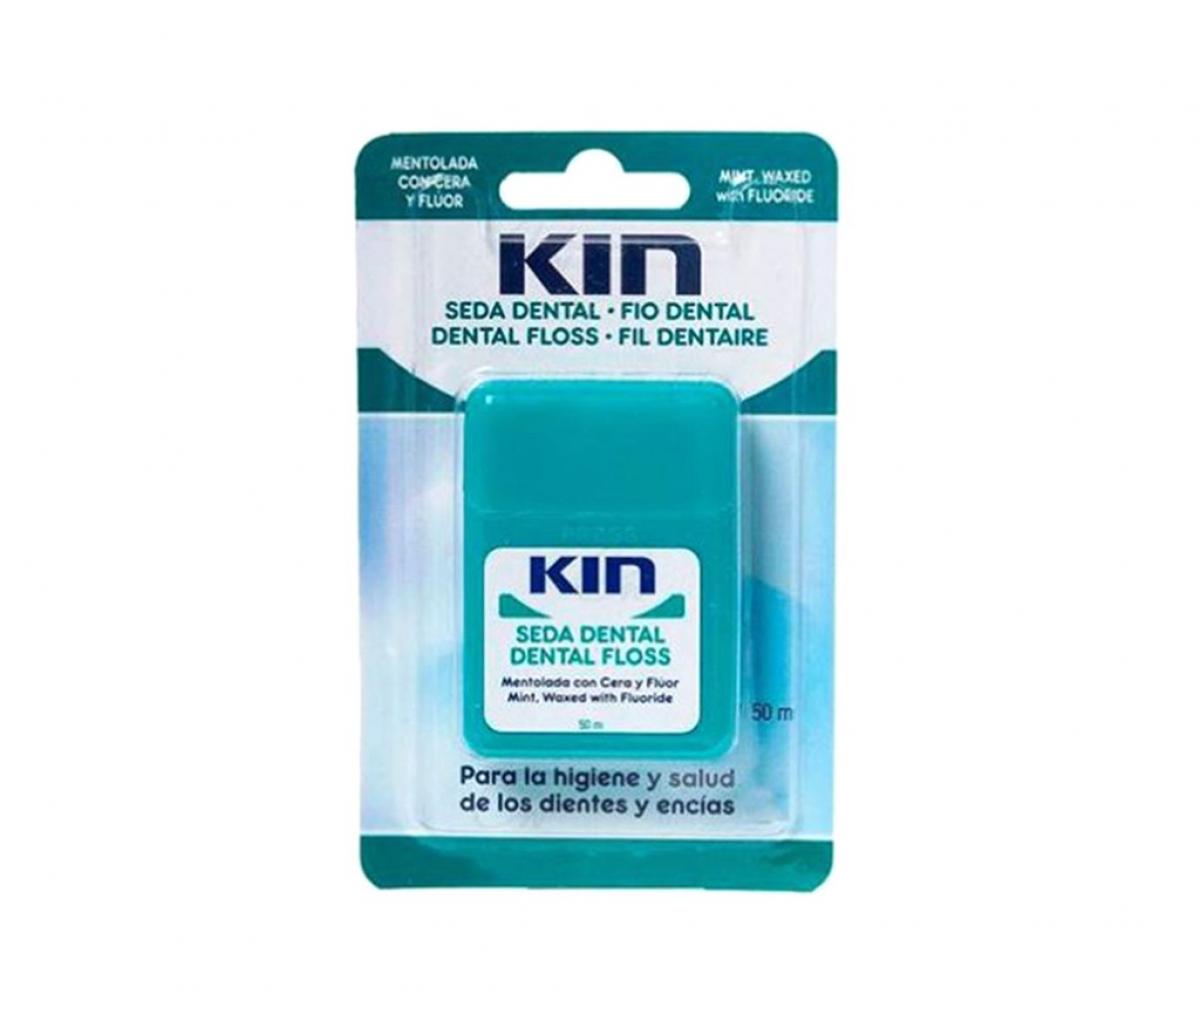 KIN Dental Floss